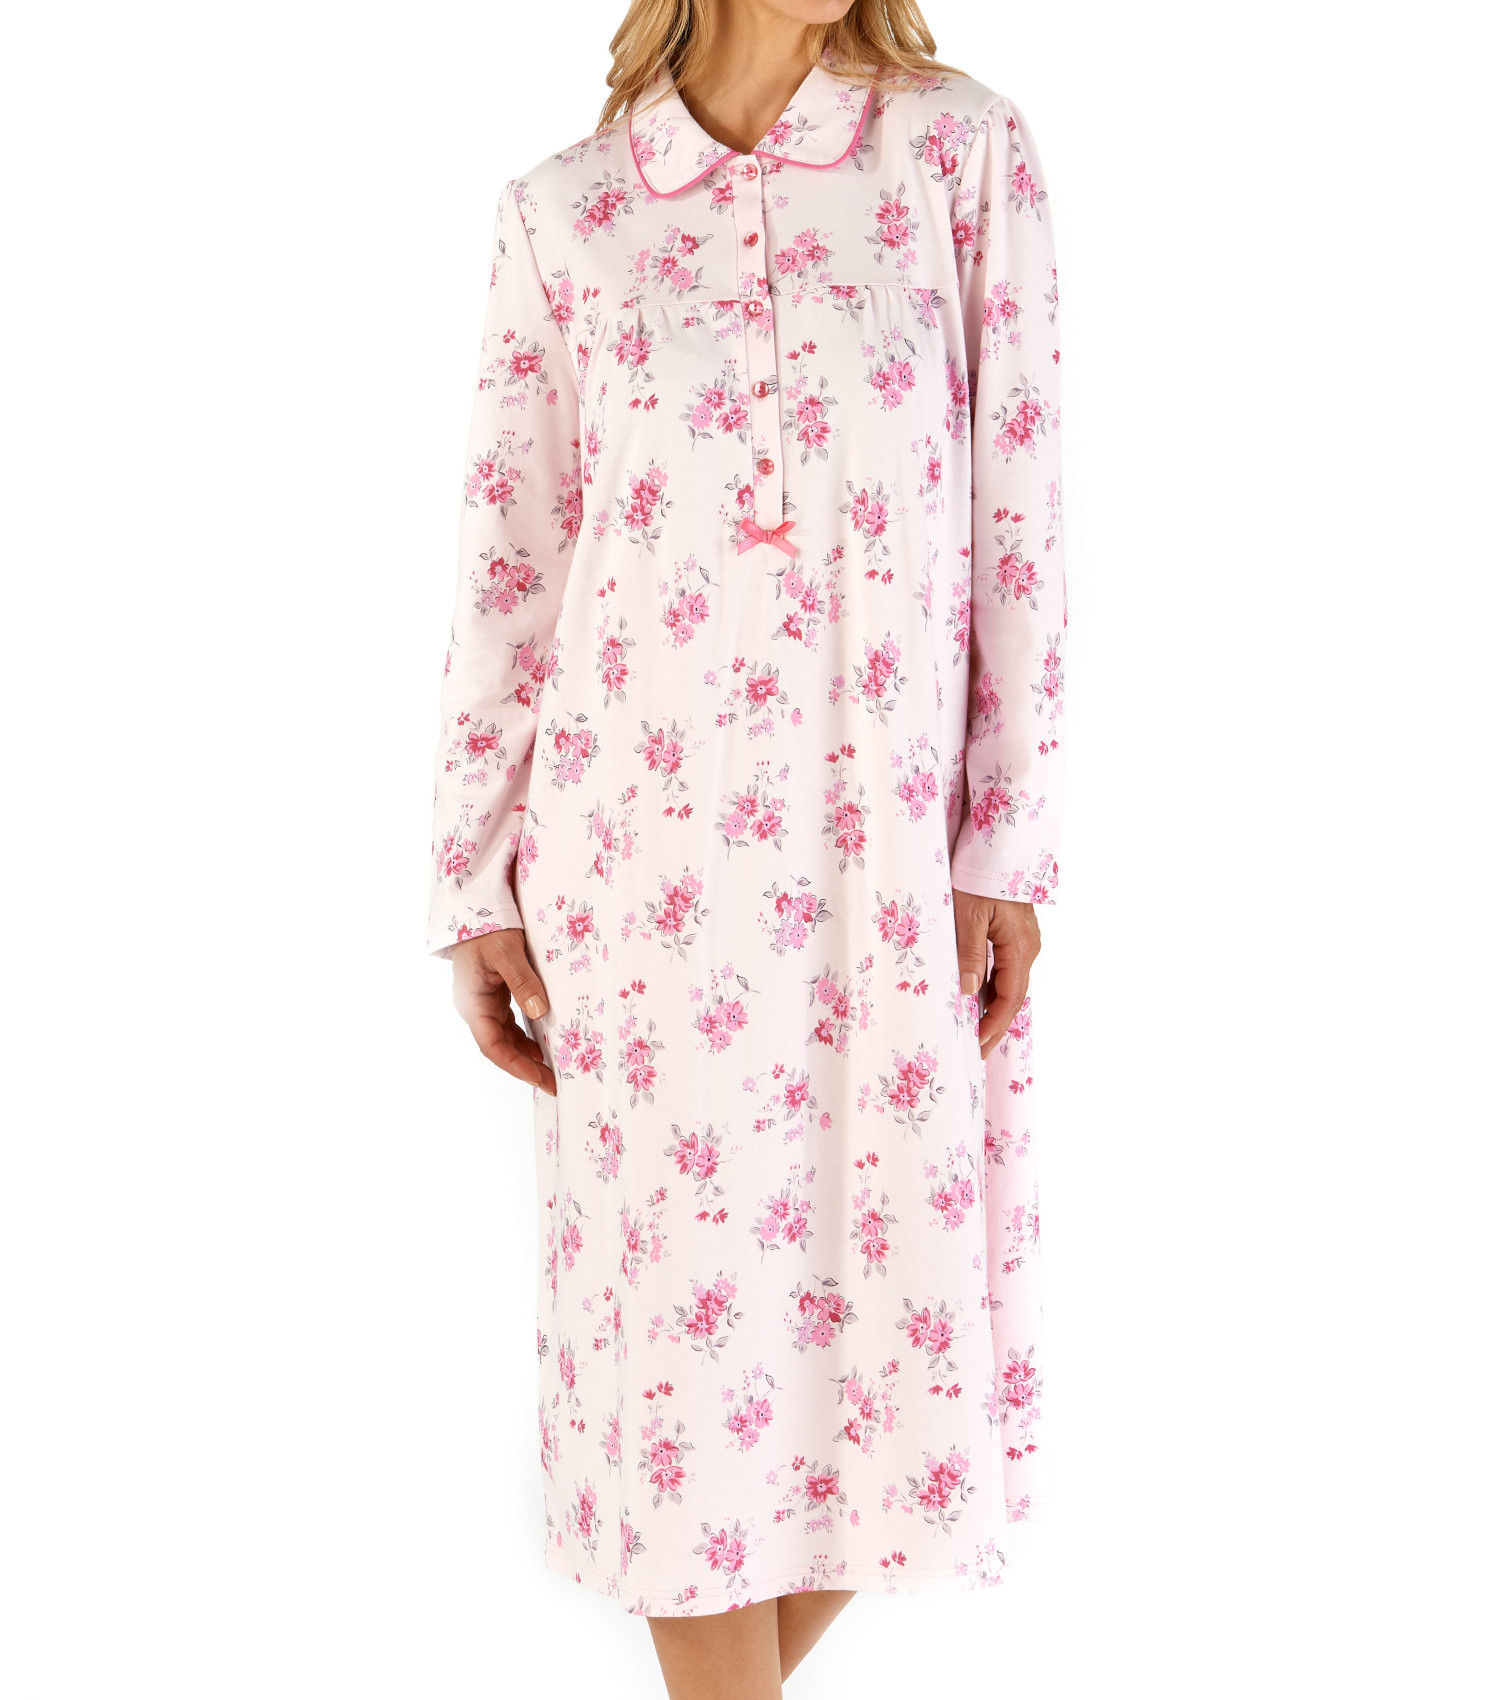 Ladies Slenderella Cotton Classic Floral Long Sleeve Jersey Nightie Nightdress